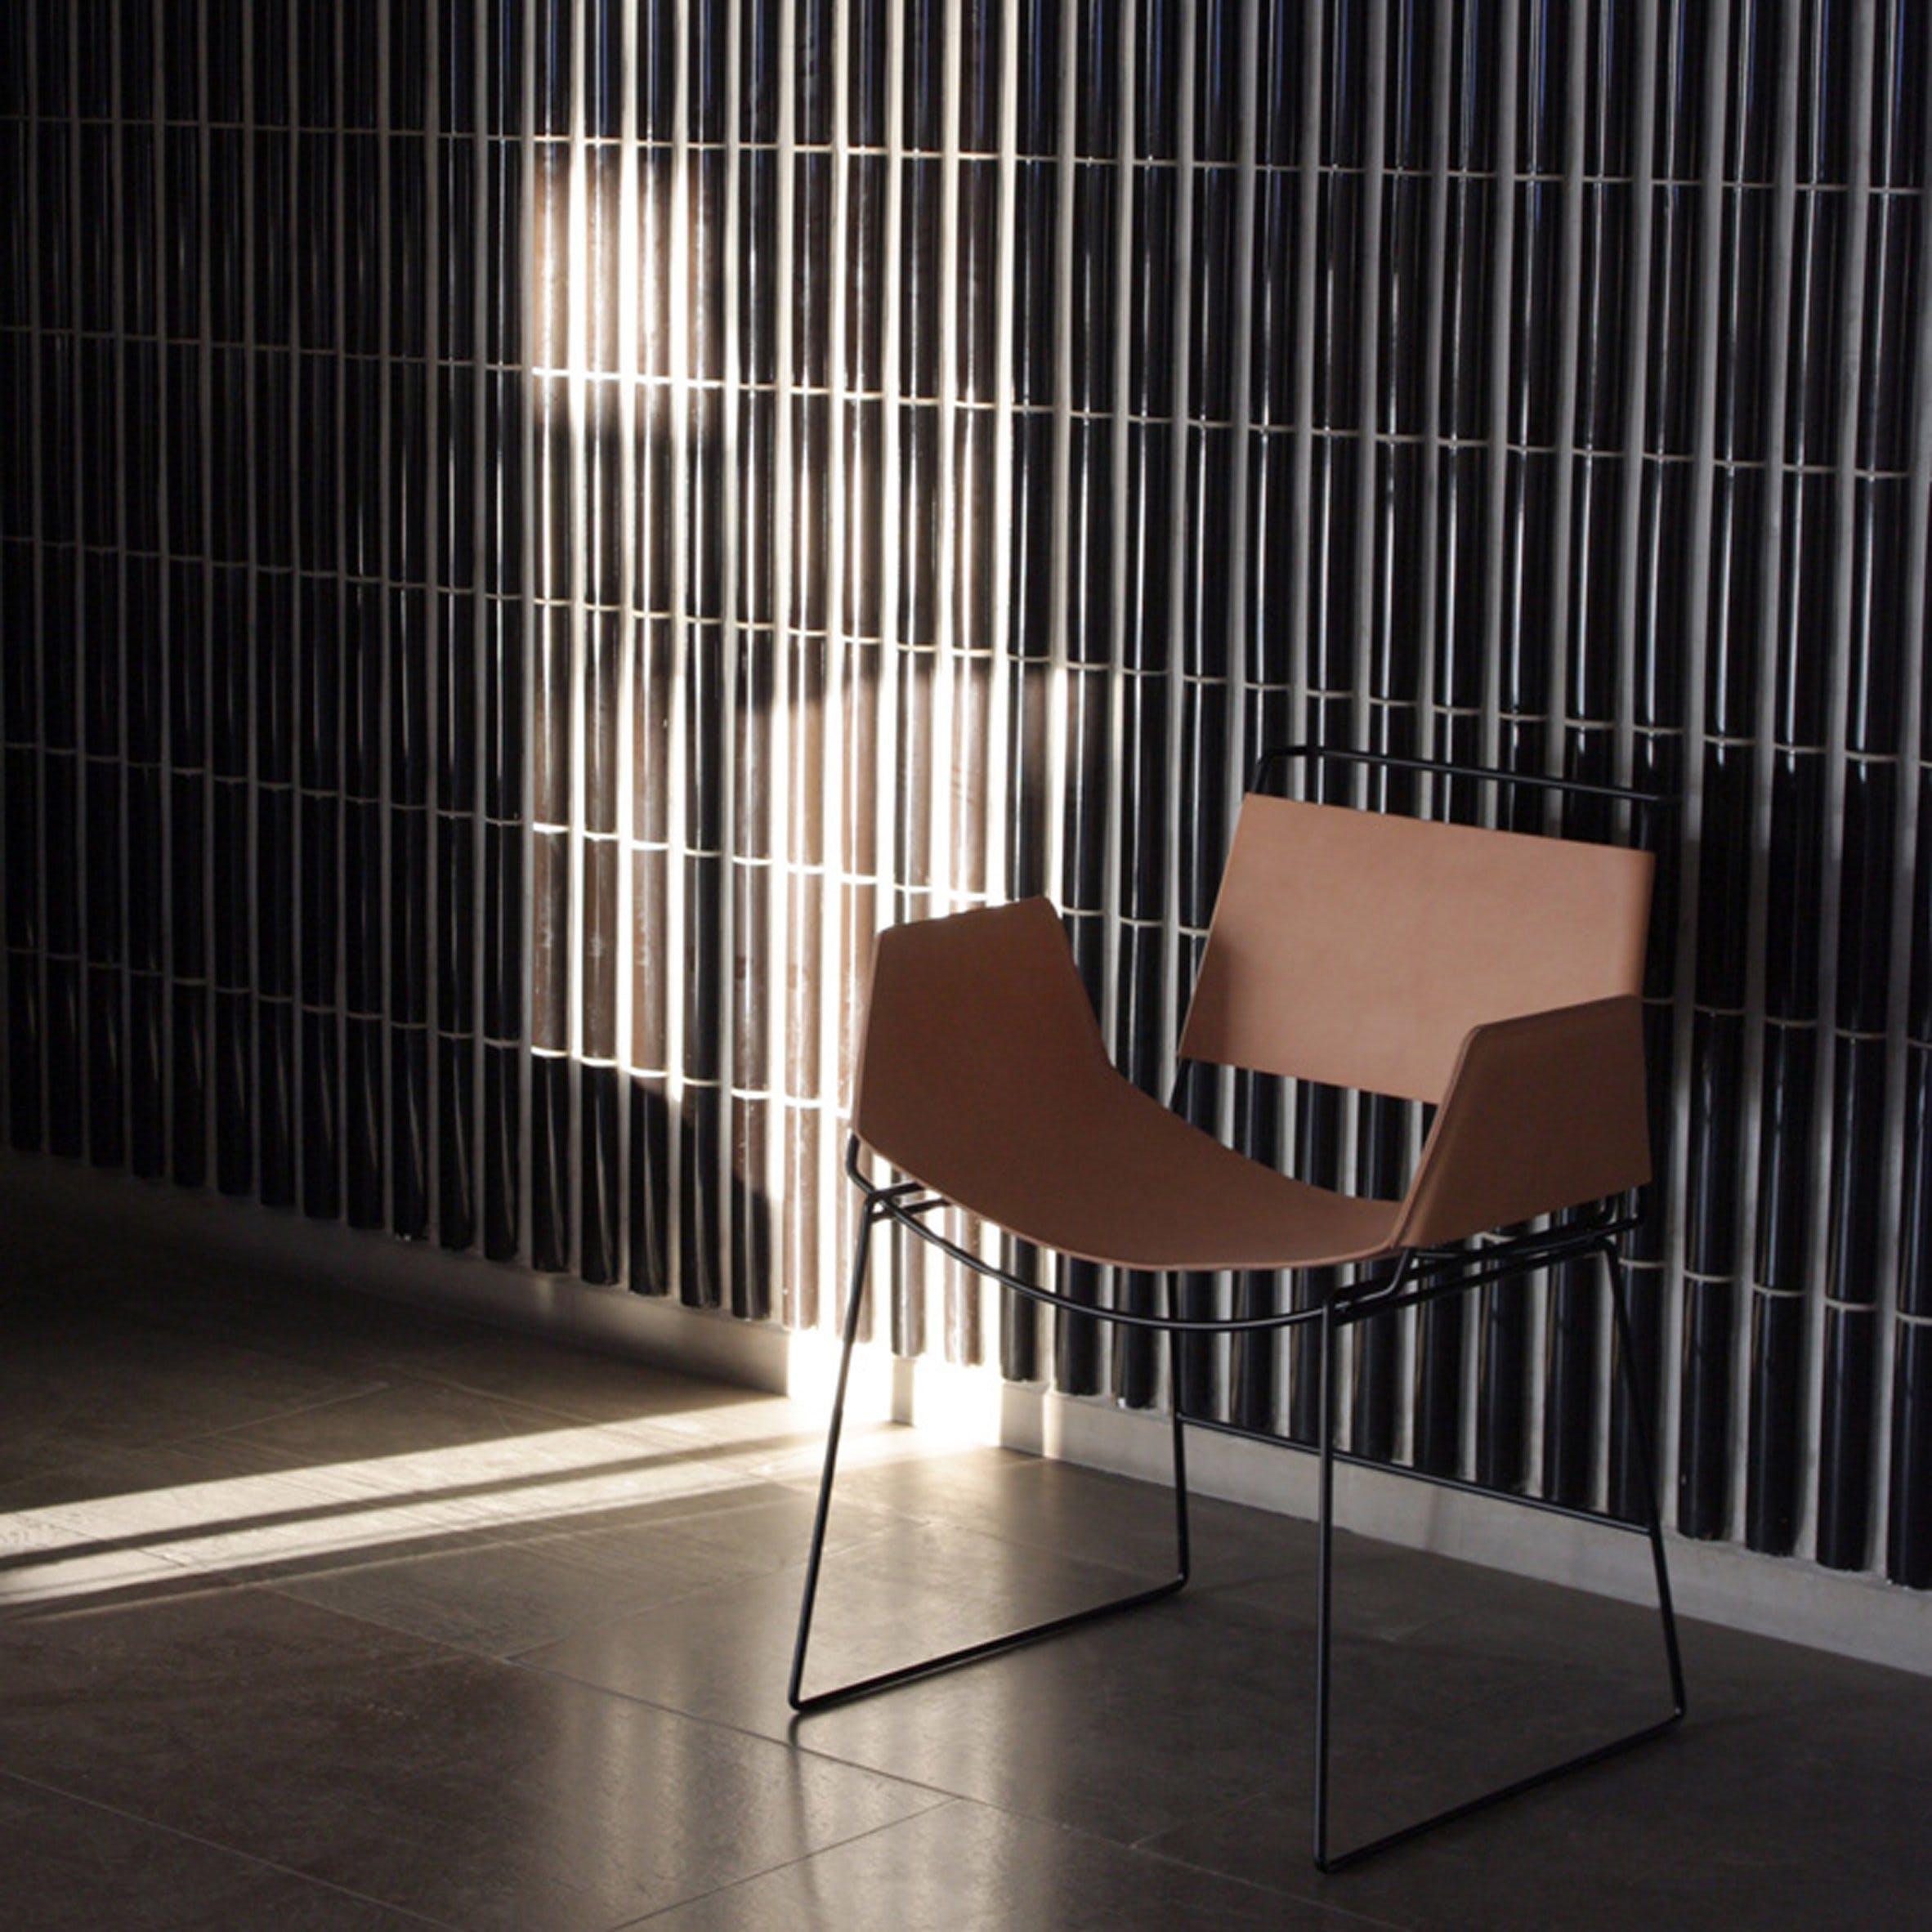 Bauhaus-æstetik og Aalto